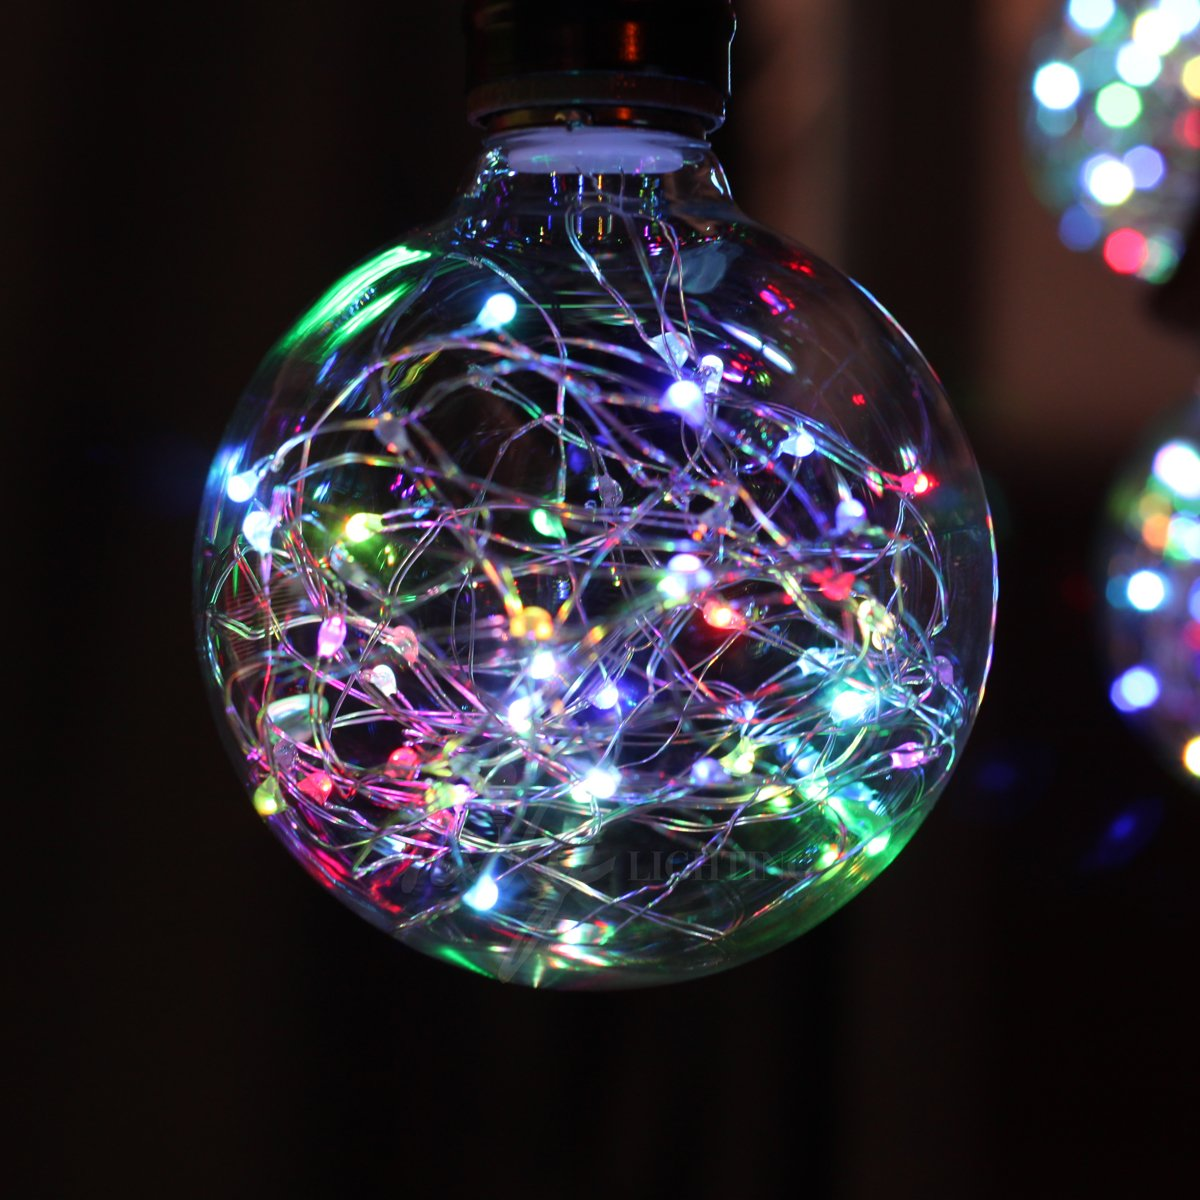 Judy Lighting - G95 LED Edison Flickering Bulb E26 Decorative Twinkling Starry Glass String Light Bulb Colorful Flashing Globe Sparkle Fairy Light, Romantic Festive Holiday Decoration